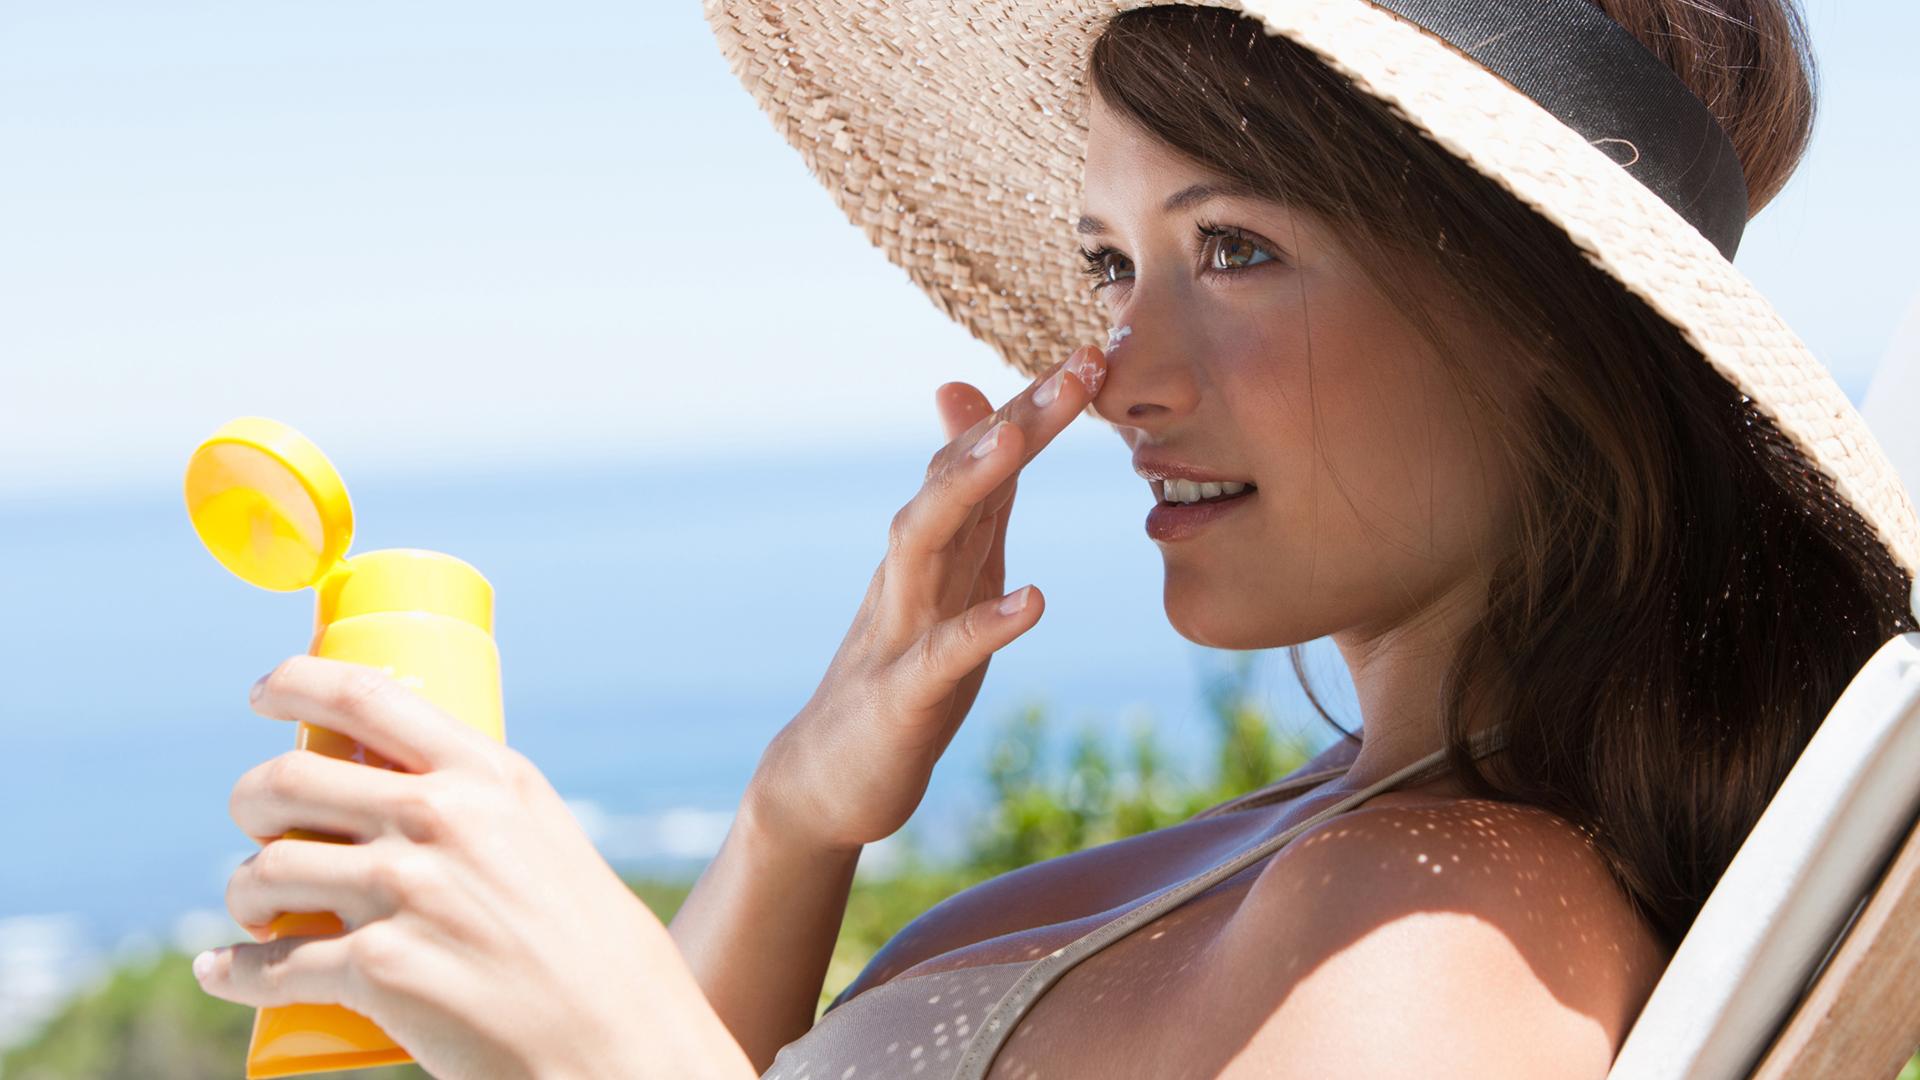 women in hat on beach putting on suncscreen